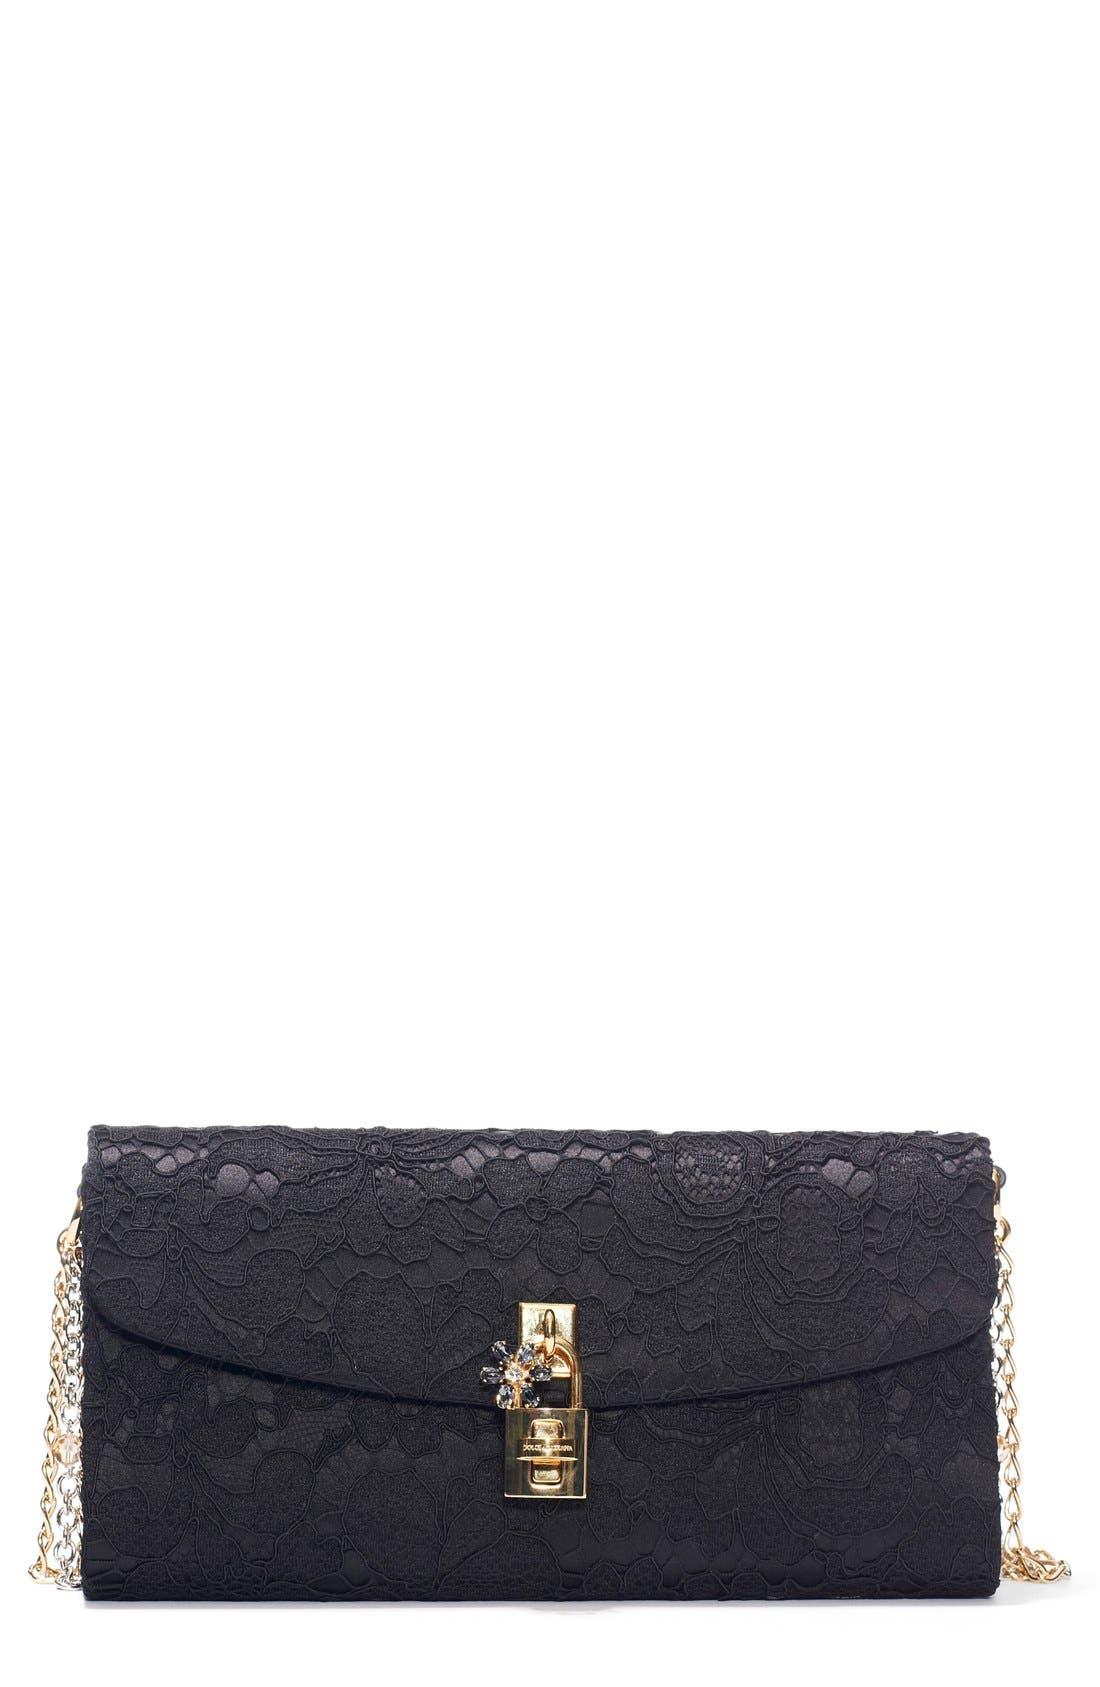 Dolce&Gabbana Lace Pouchette Clutch